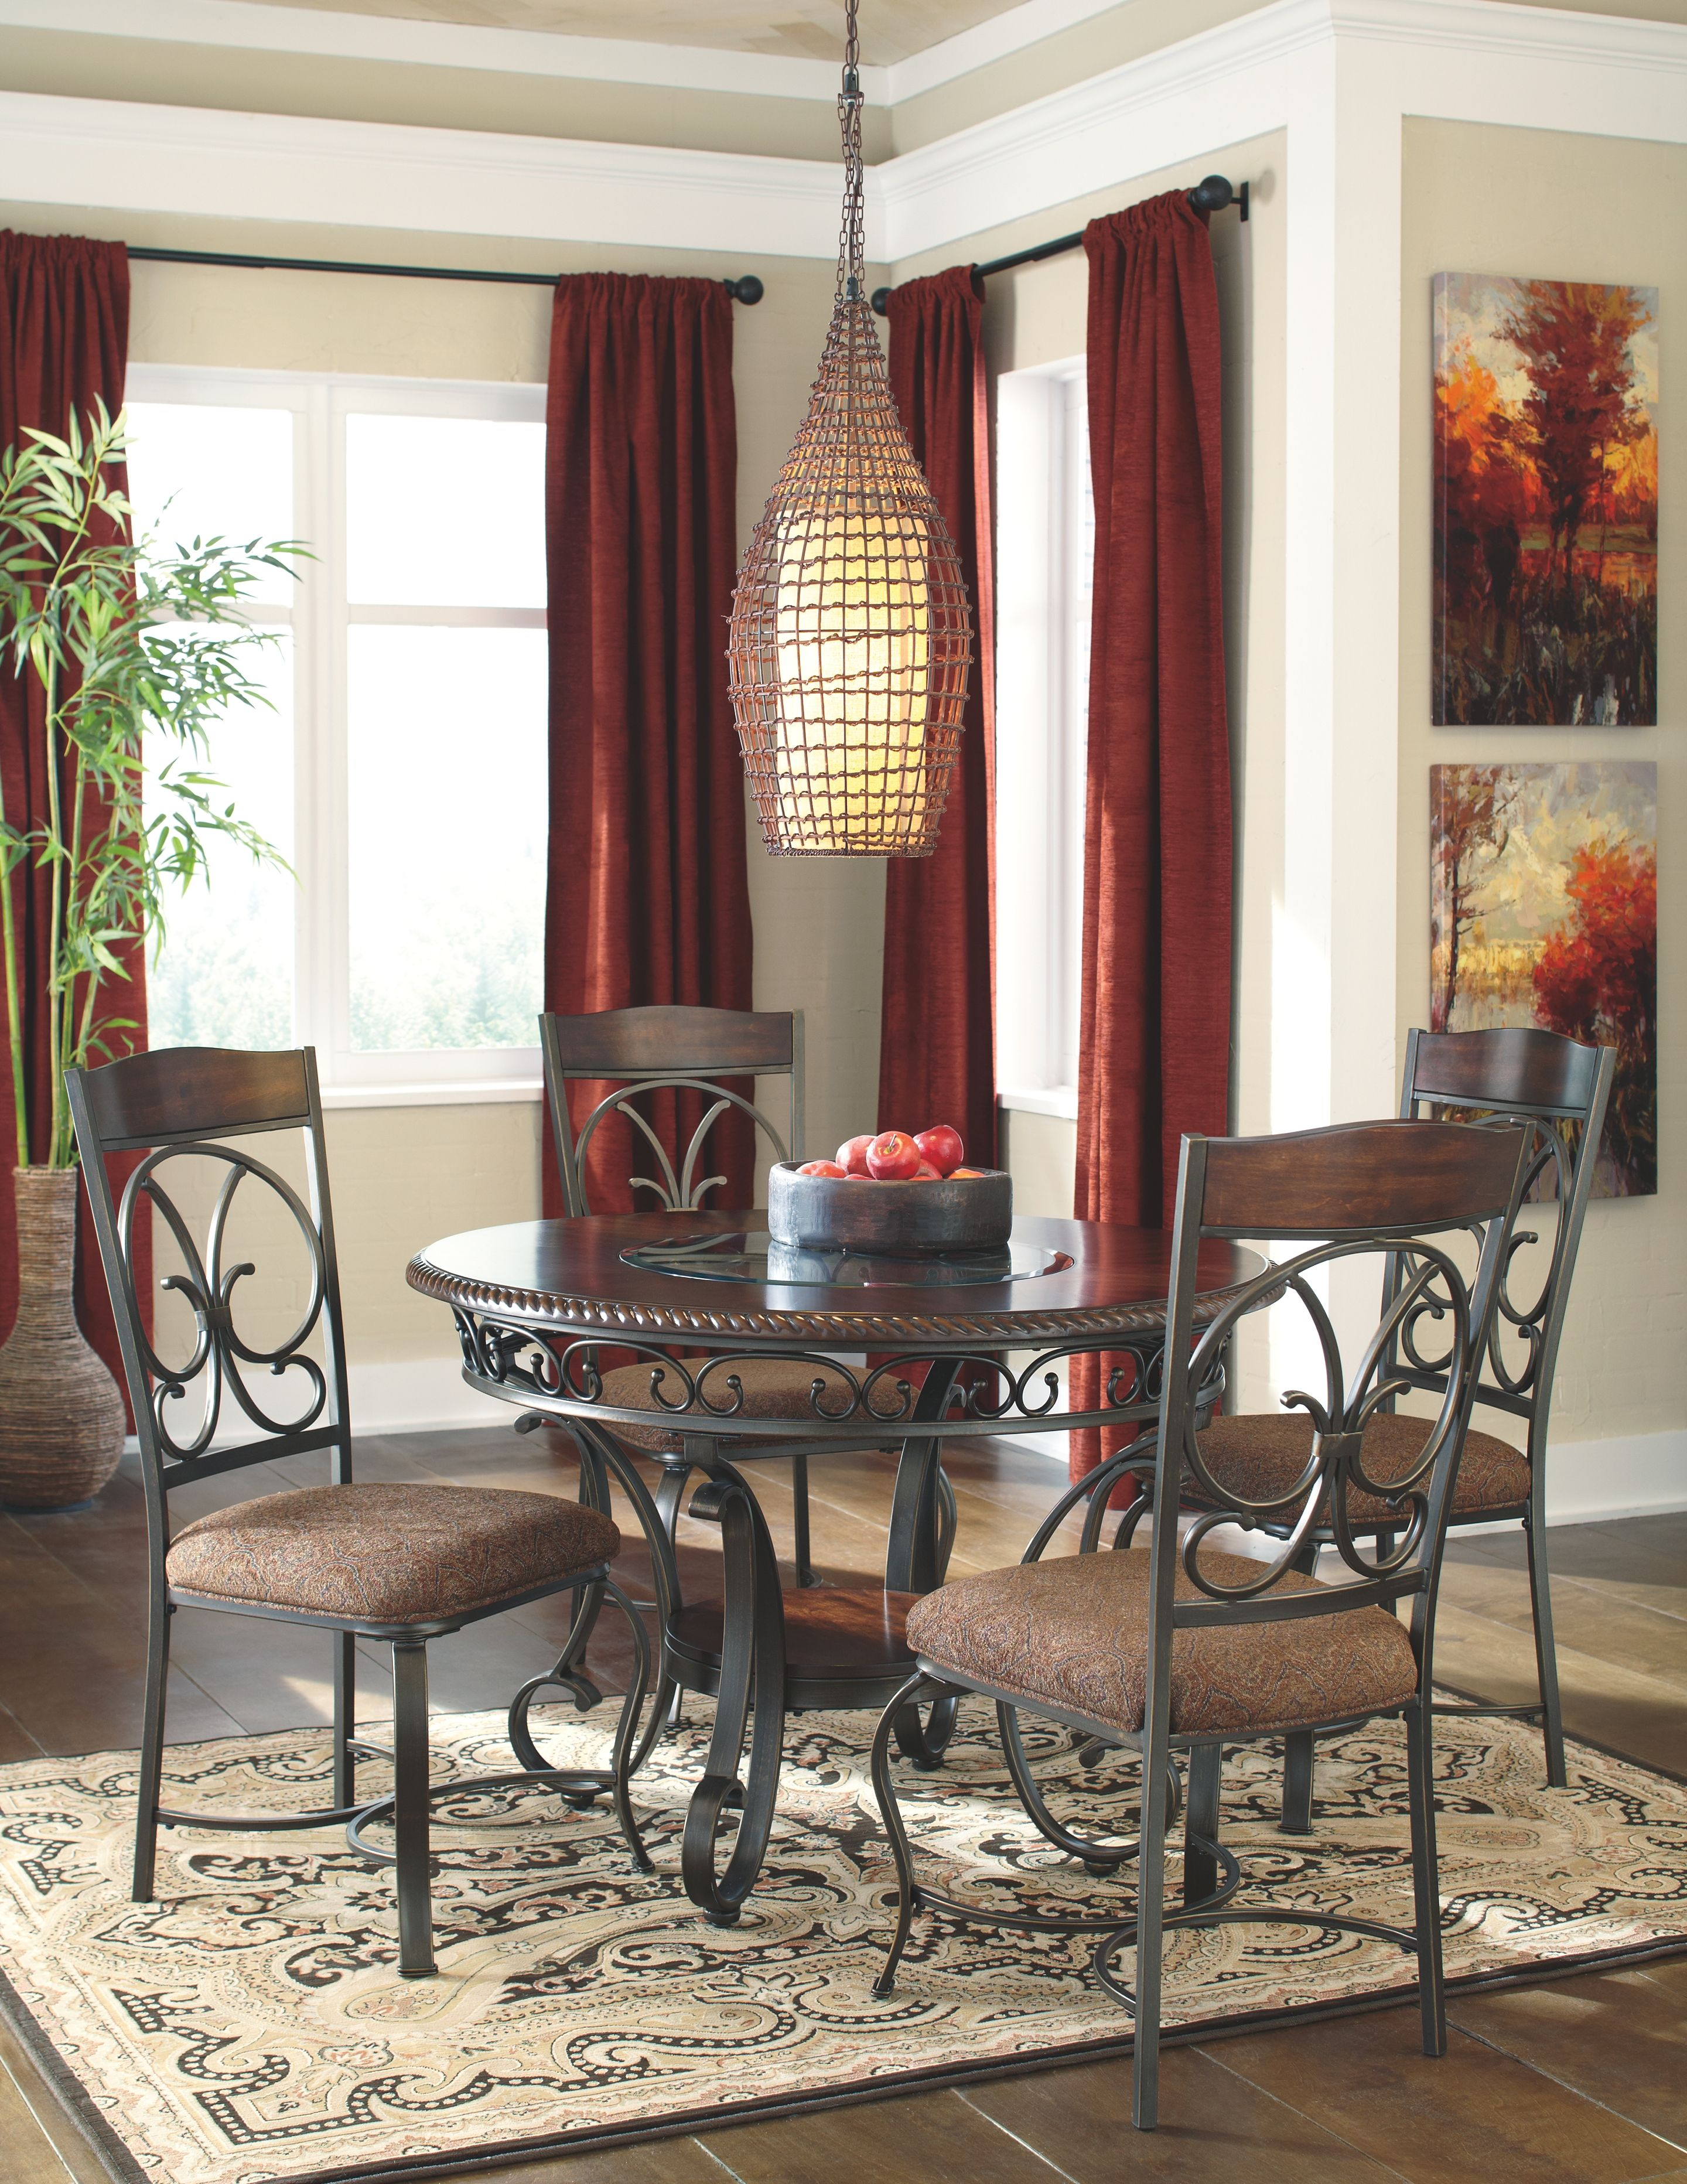 Glambrey 5 Piece Dining Room Brown Metal Dining Room Round Dining Room Round Metal Dining Room Table